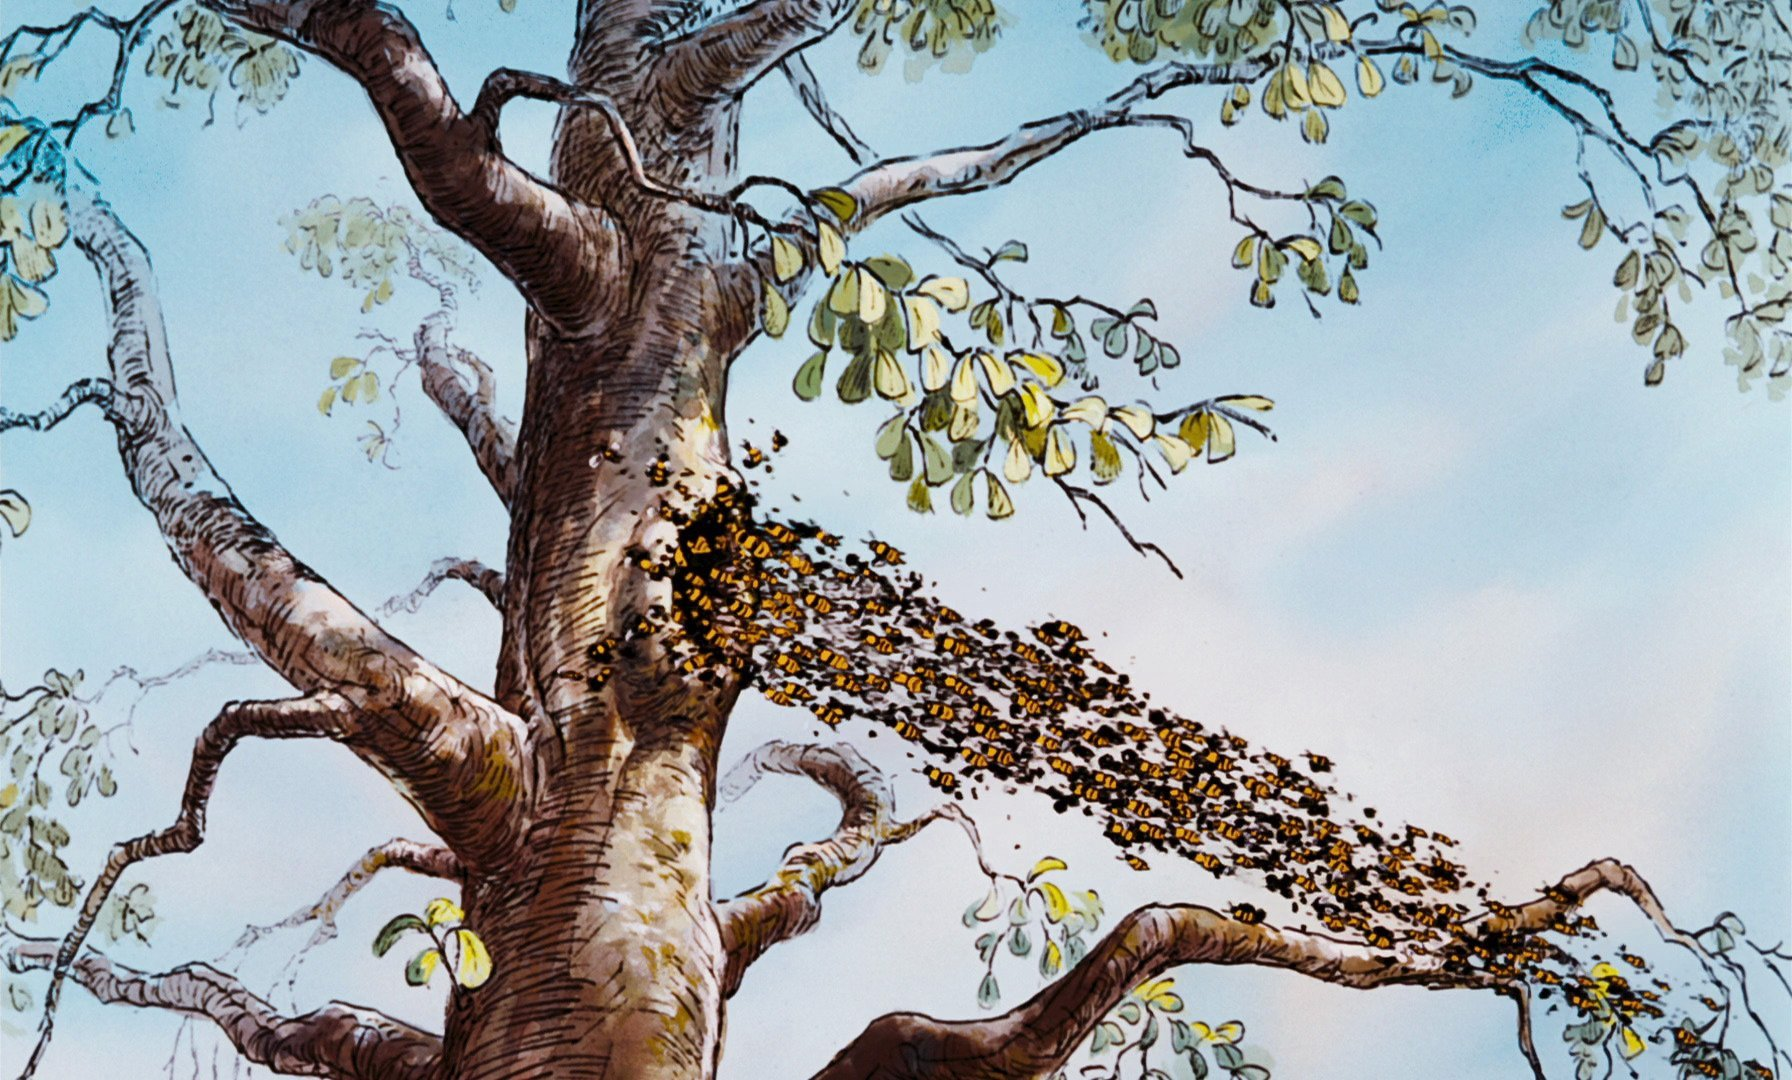 The Bees | Disney Wiki | Fandom